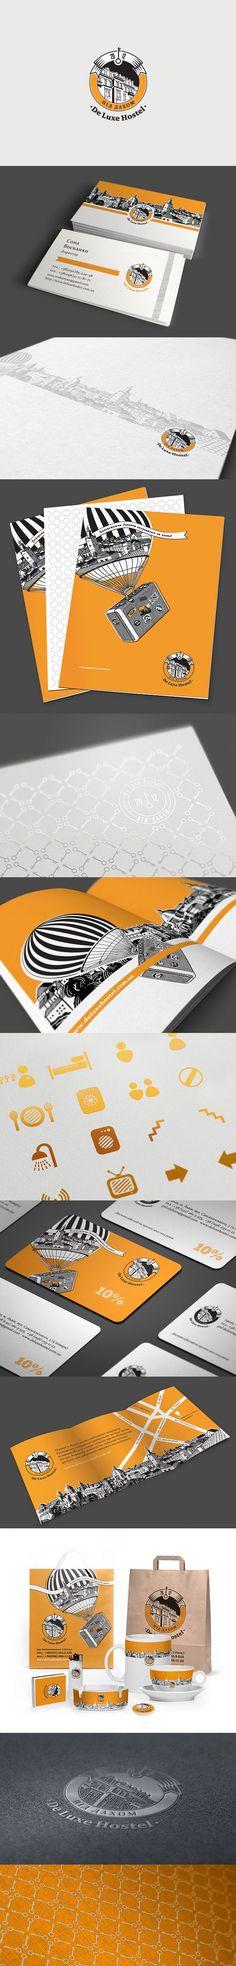 Branding of the De Luxe Hostel. Pretty, right?  | Hostel Branding | Hostel advertising | Hostel Visual Identity | Illustrative brand | Creative Advertising | Menu Inspiration | Illustration | Hostel Graphic Design | Ideas Logo | Hospitality Branding | Brand Design | Creative Hostel | Hostel Logo | Hospitality logo | Hotel Logo | Hotel Design | Hotel Branding